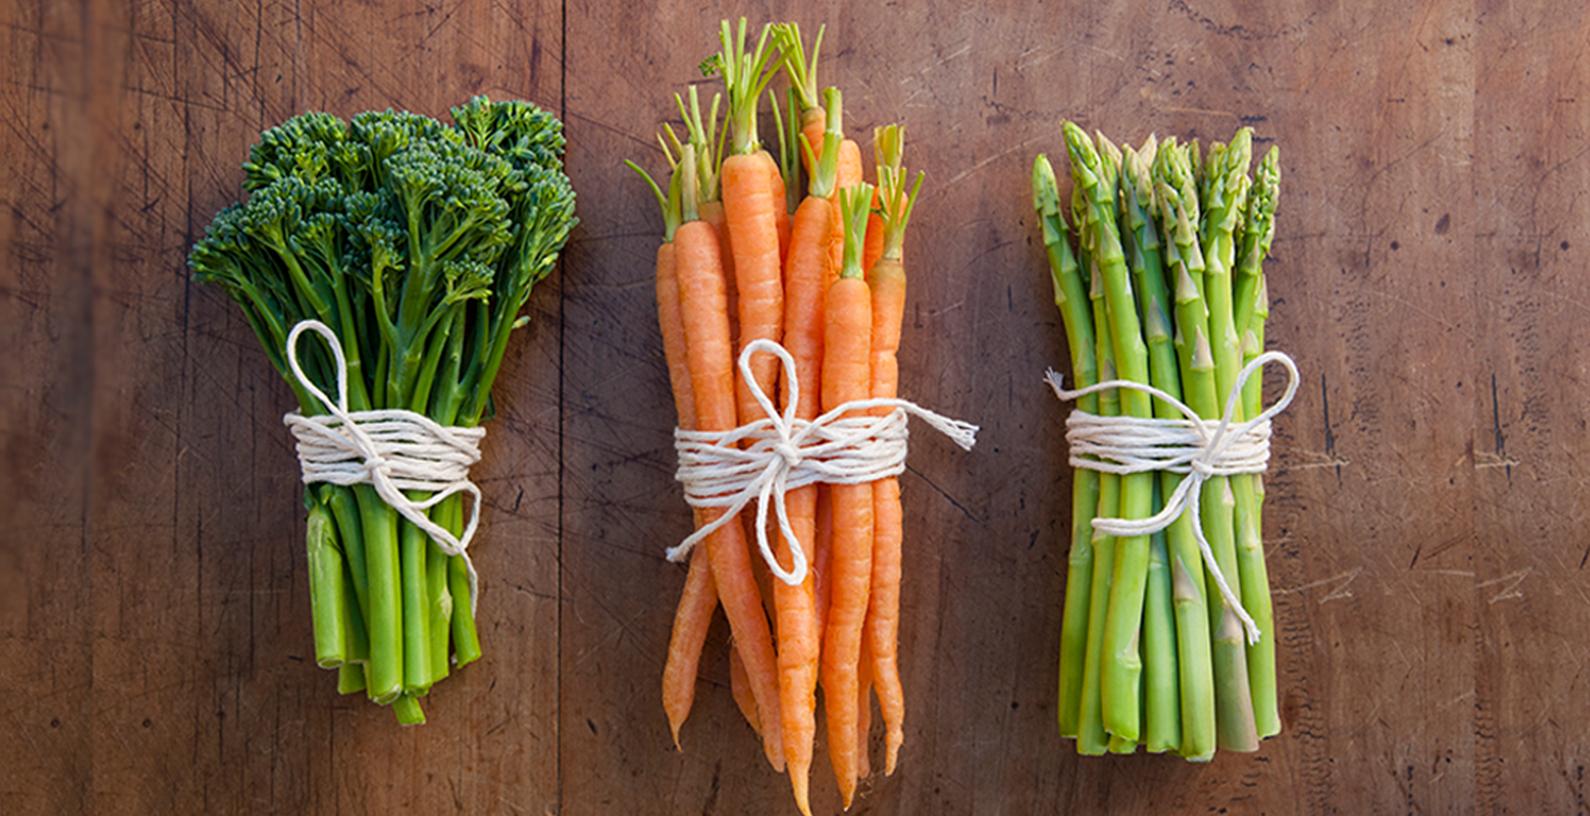 30 High Fiber Foods To Up Your Daily Fiber Intake Metamucil